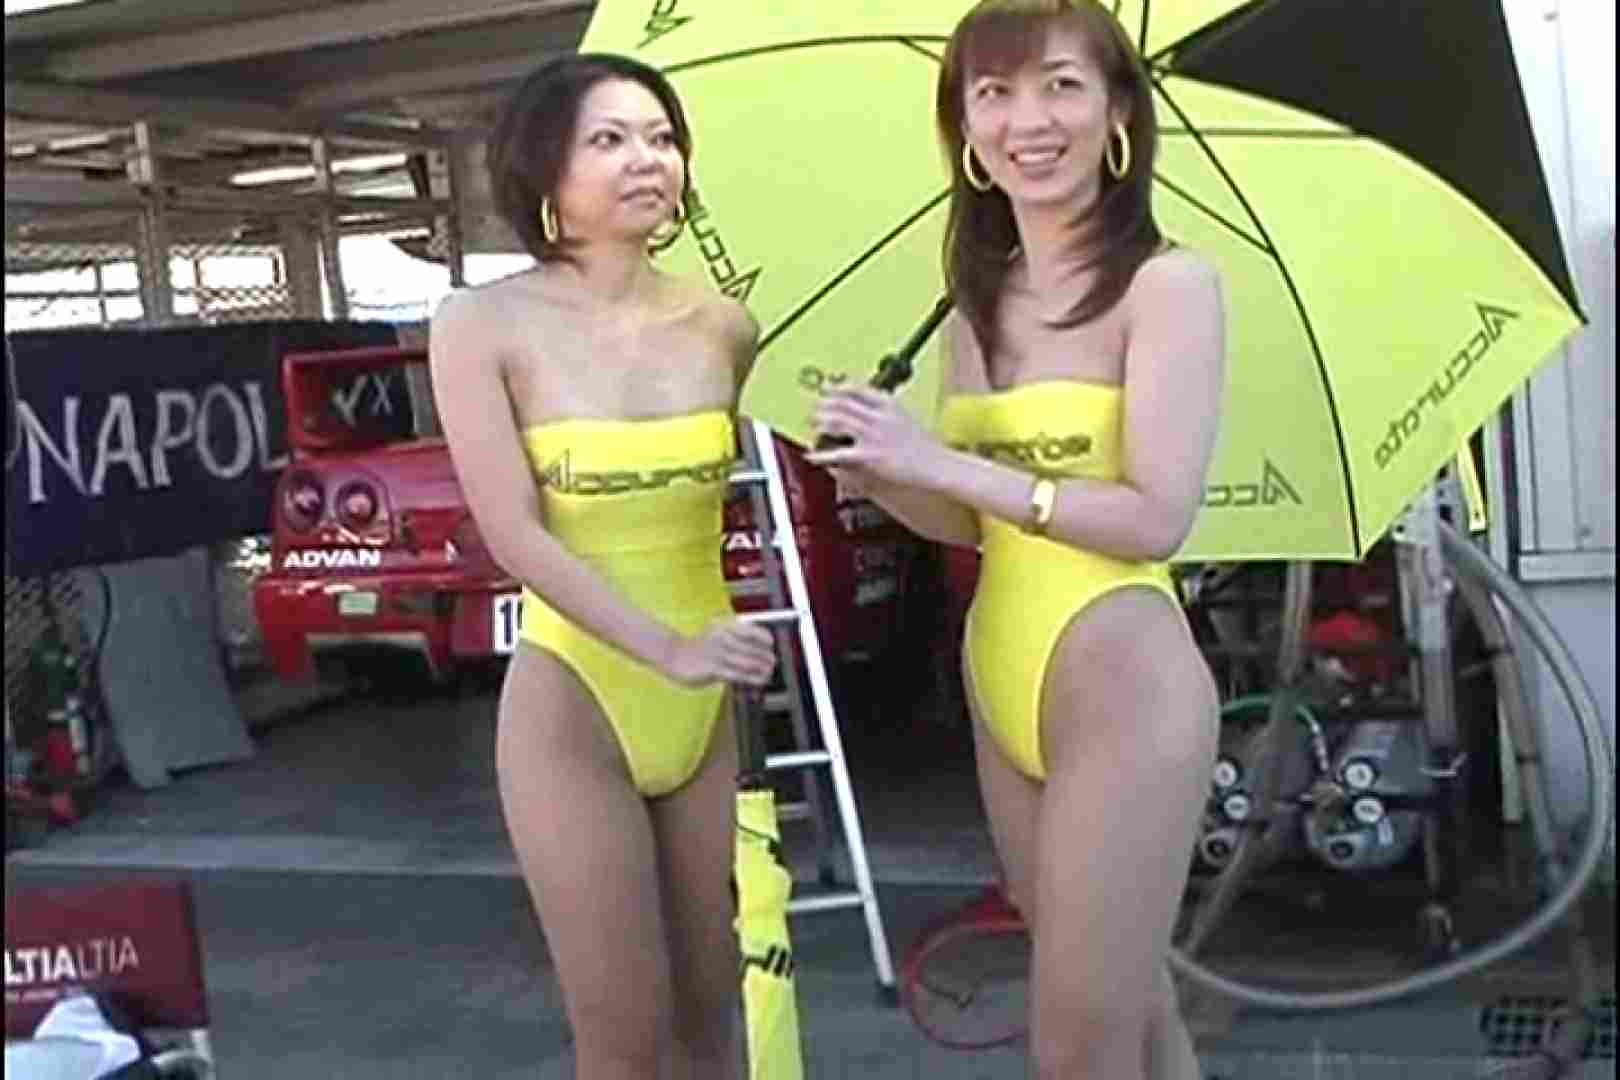 RQカメラ地獄Vol.13 レースクイーン 盗撮おめこ無修正動画無料 95画像 79